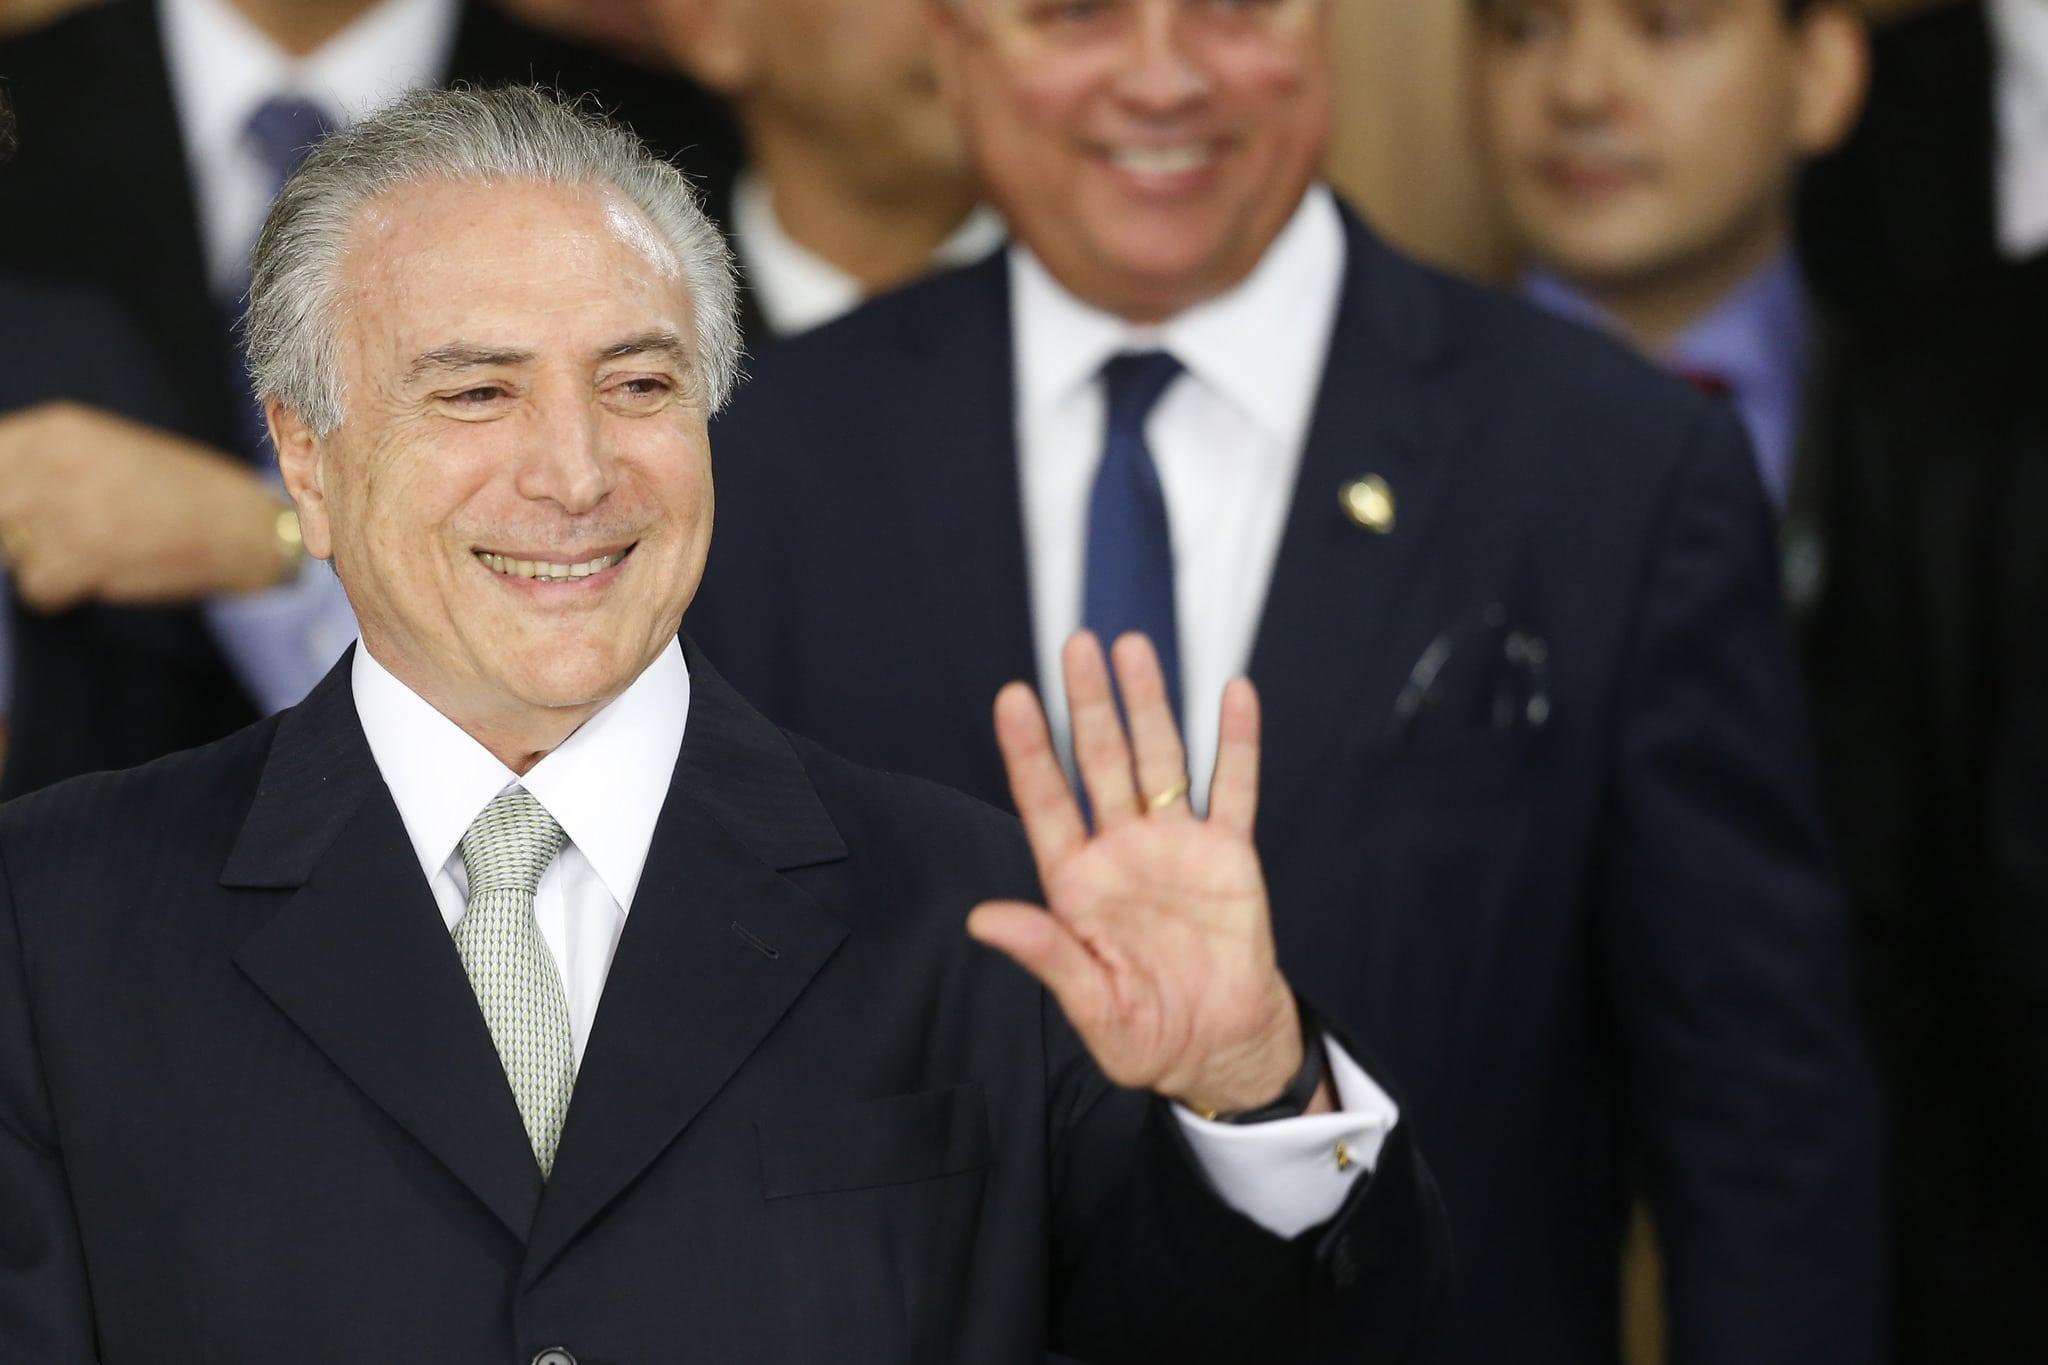 Michel Temer, presidente (no electo) de Brasil. FOTO: PMDB.